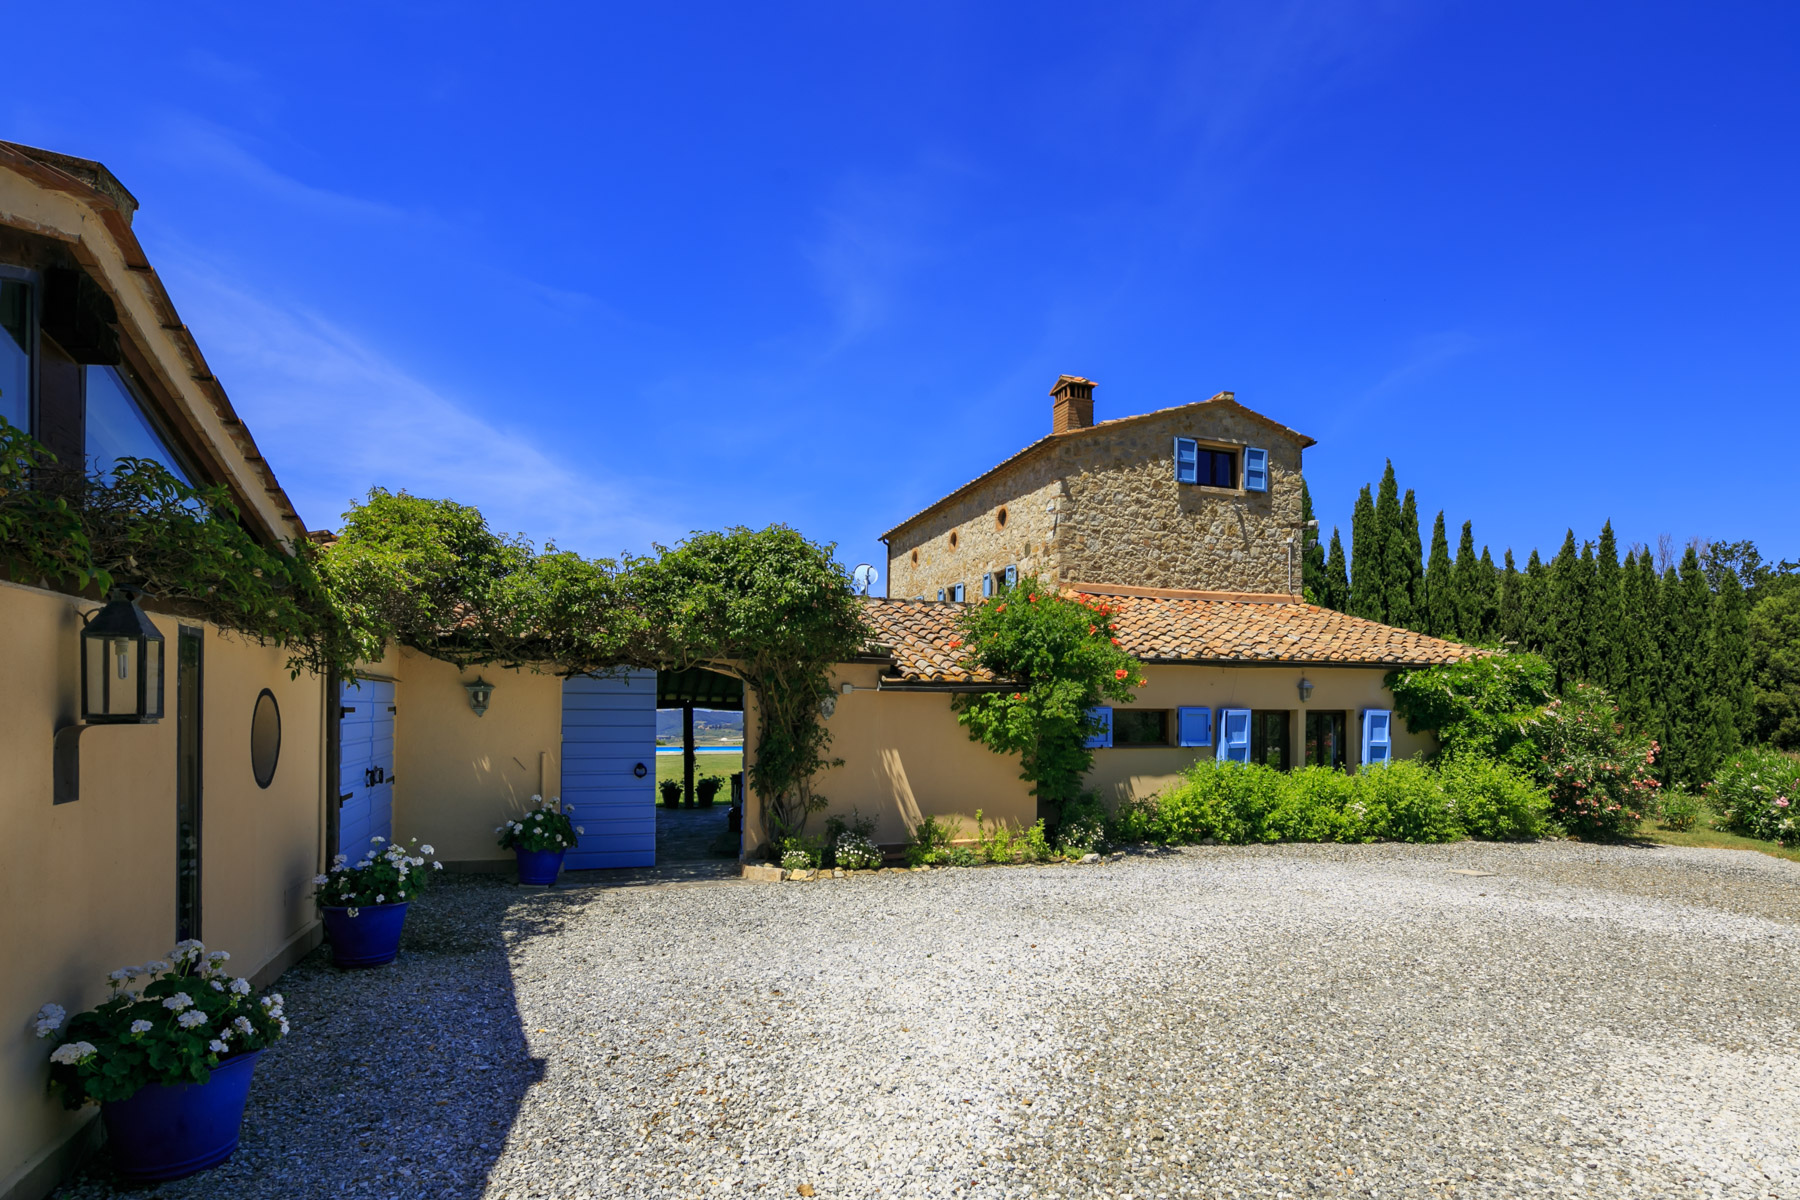 Villa in Vendita a Santa Luce: 5 locali, 270 mq - Foto 26